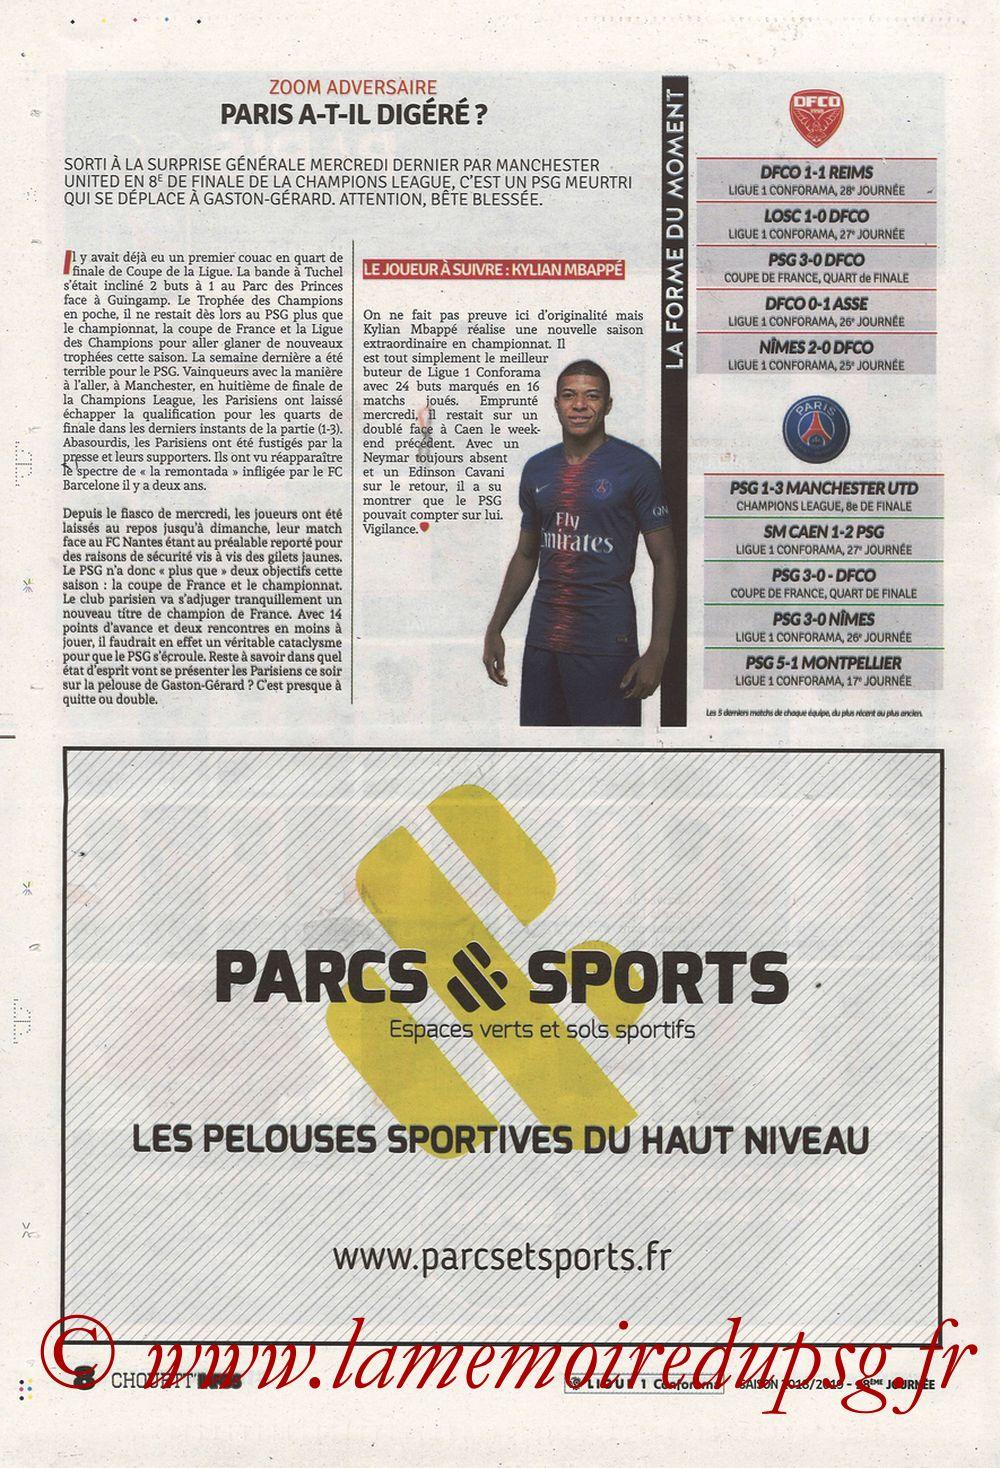 2019-03-12  Dijon-PSG (18ème L1 en retard, Chouett'Infos) - Page 08